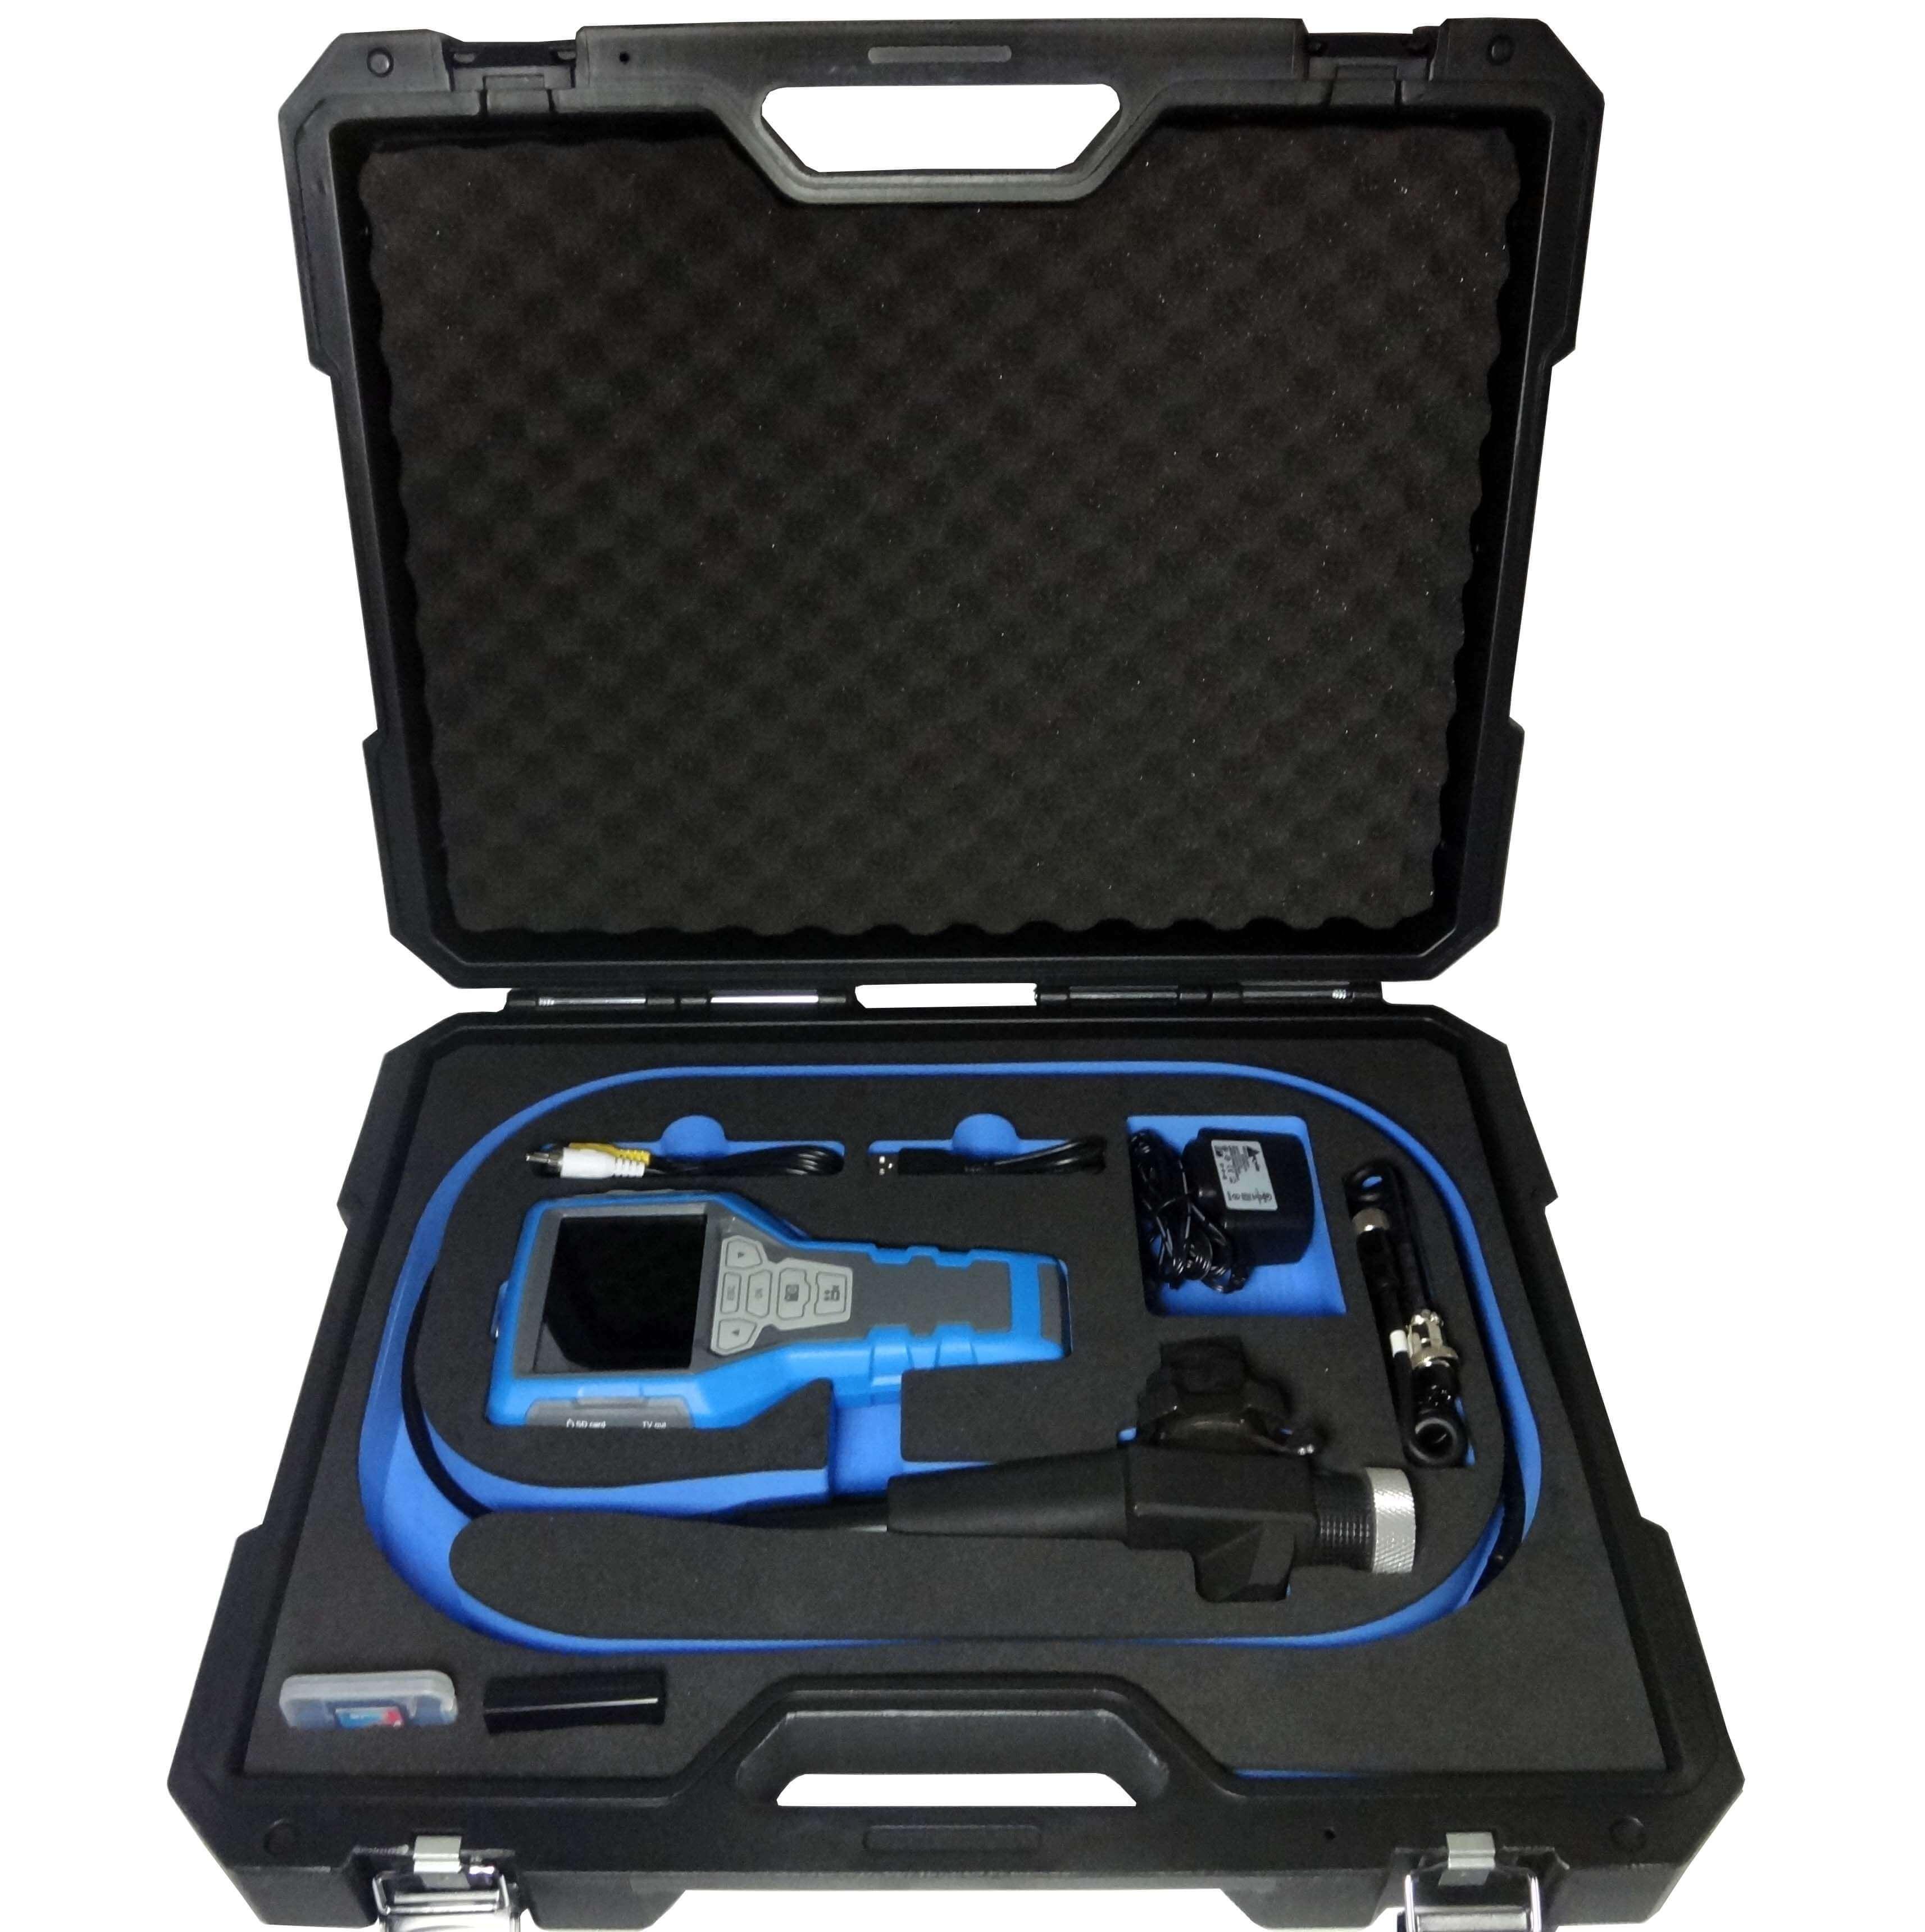 Articulation Borescope (TX101-4A62)